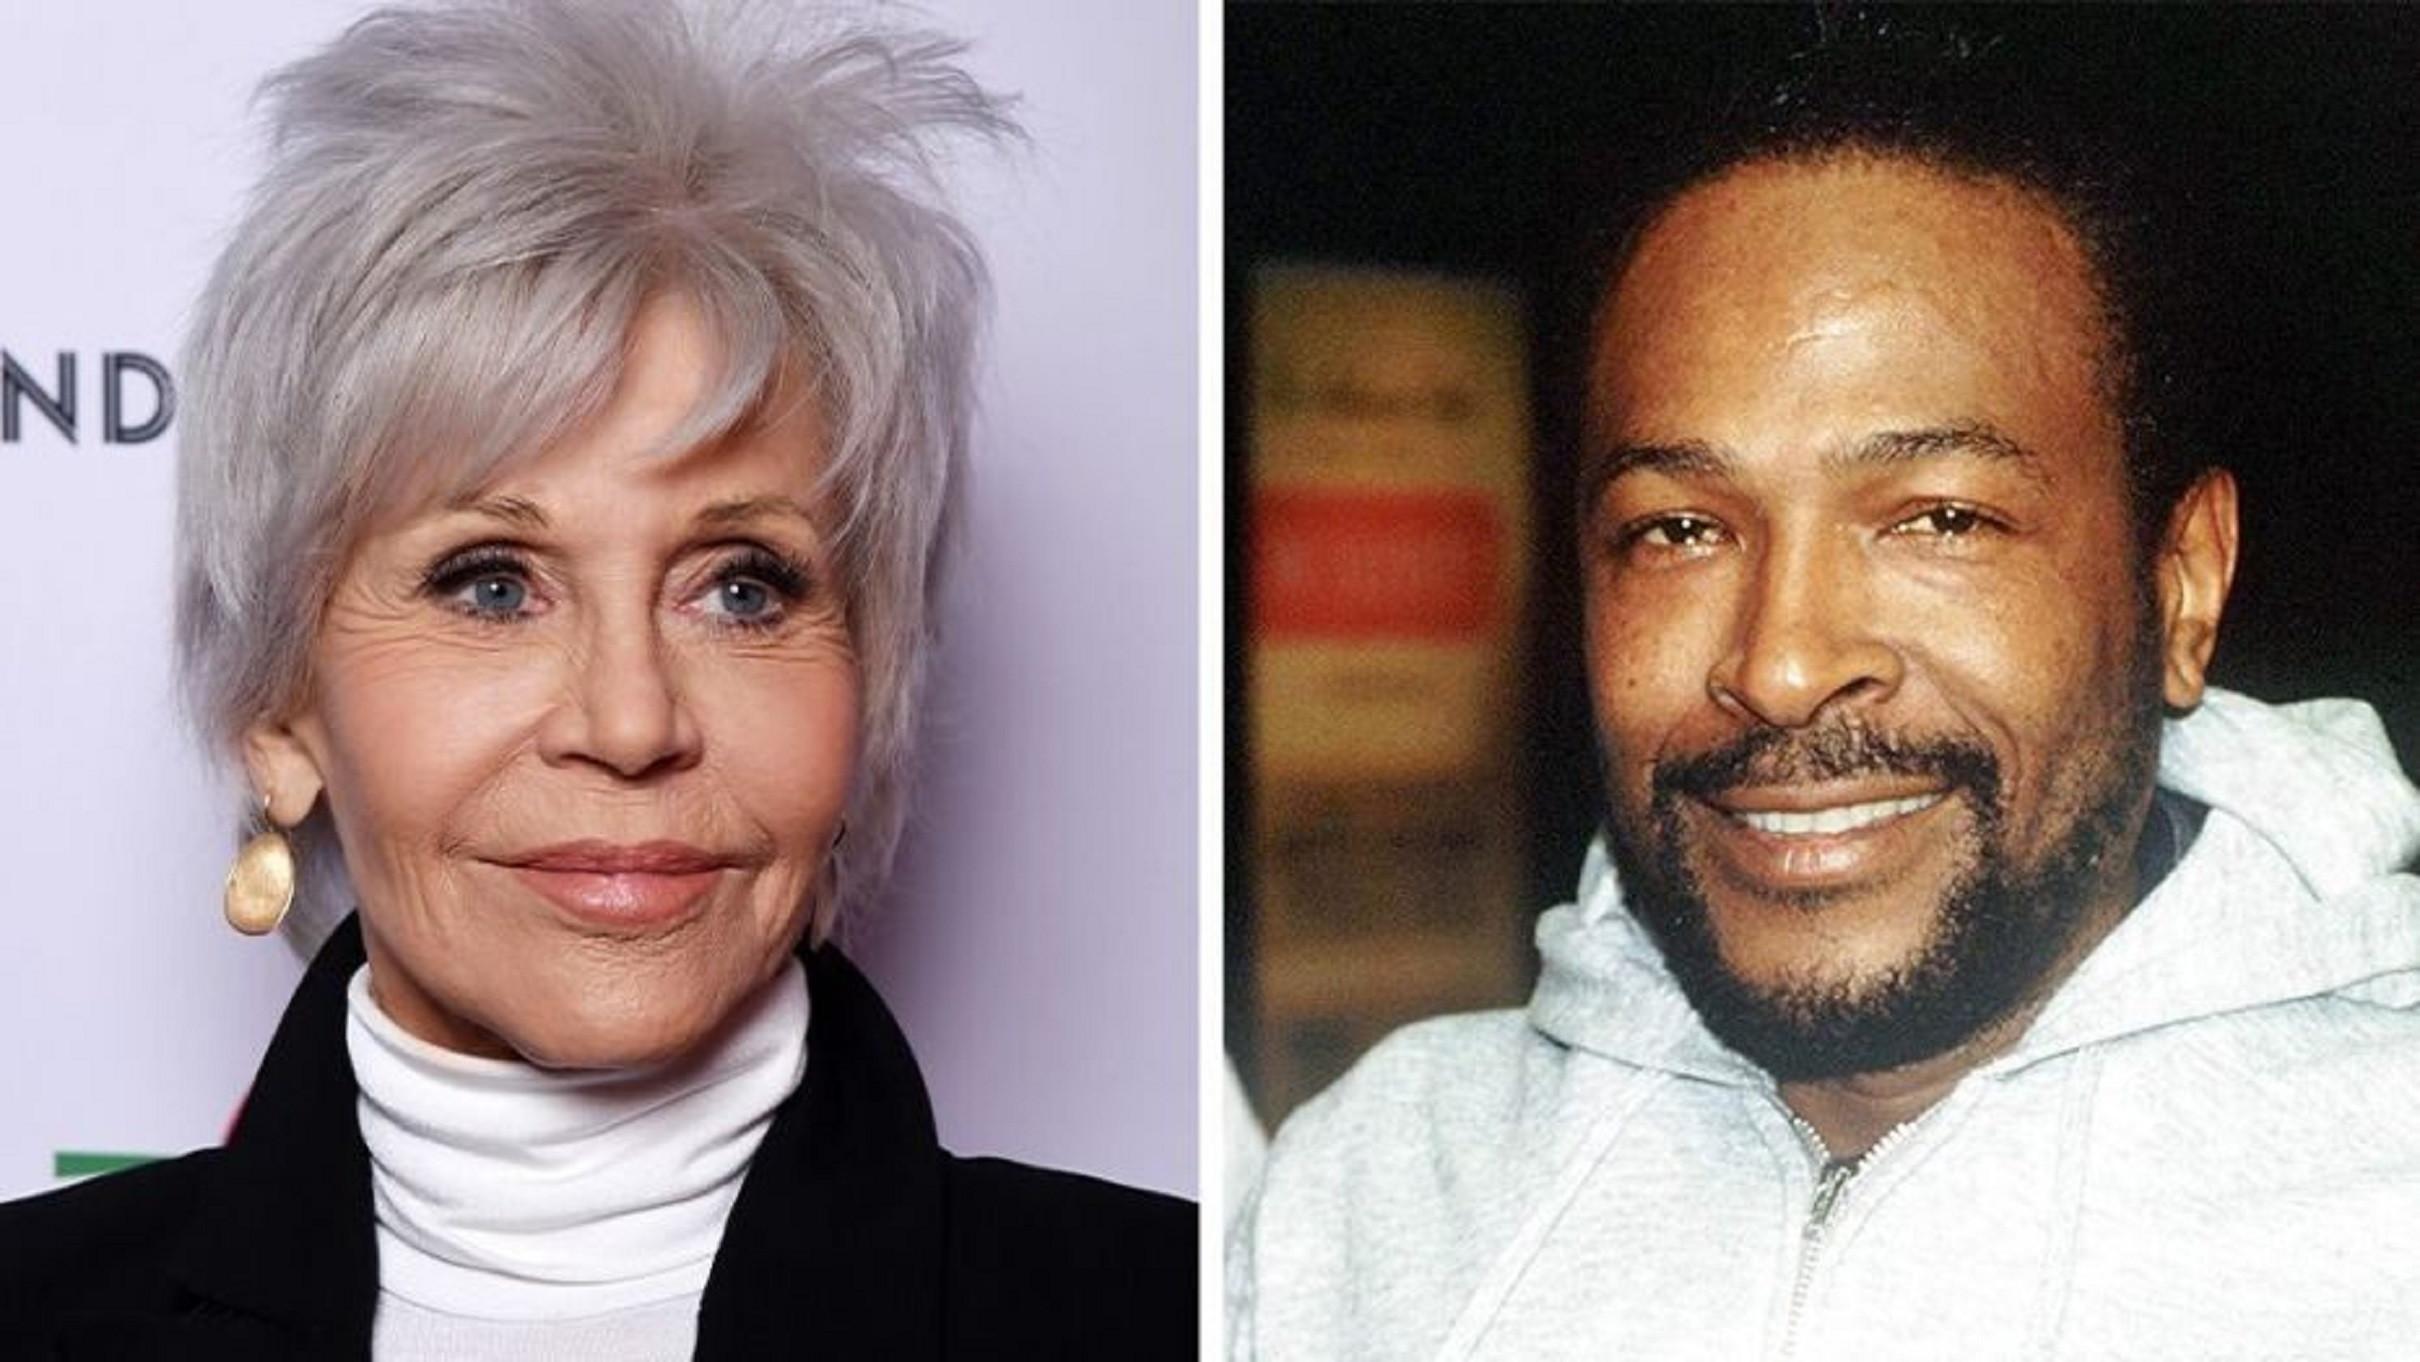 Not having sex with Marvin Gaye is a great regret - Jane Fonda lindaikejisblog